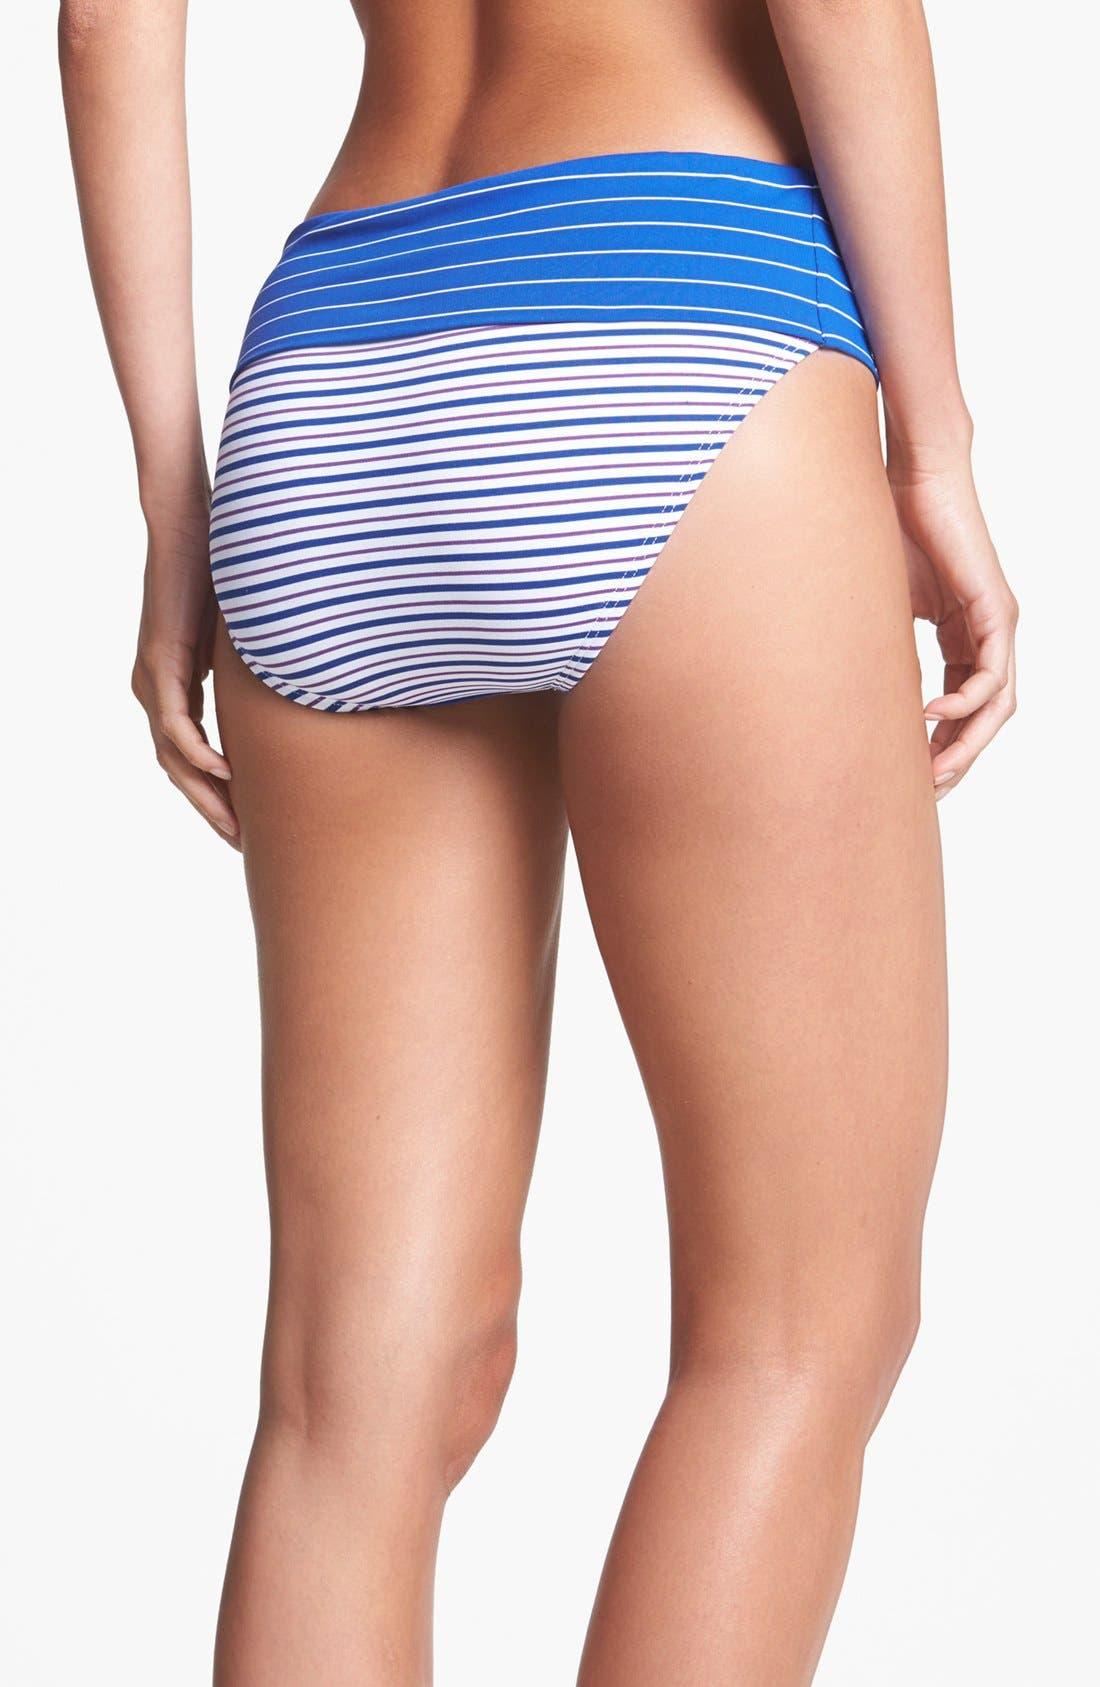 Alternate Image 2  - Tommy Bahama 'Mingling' High Waist Bikini Bottoms